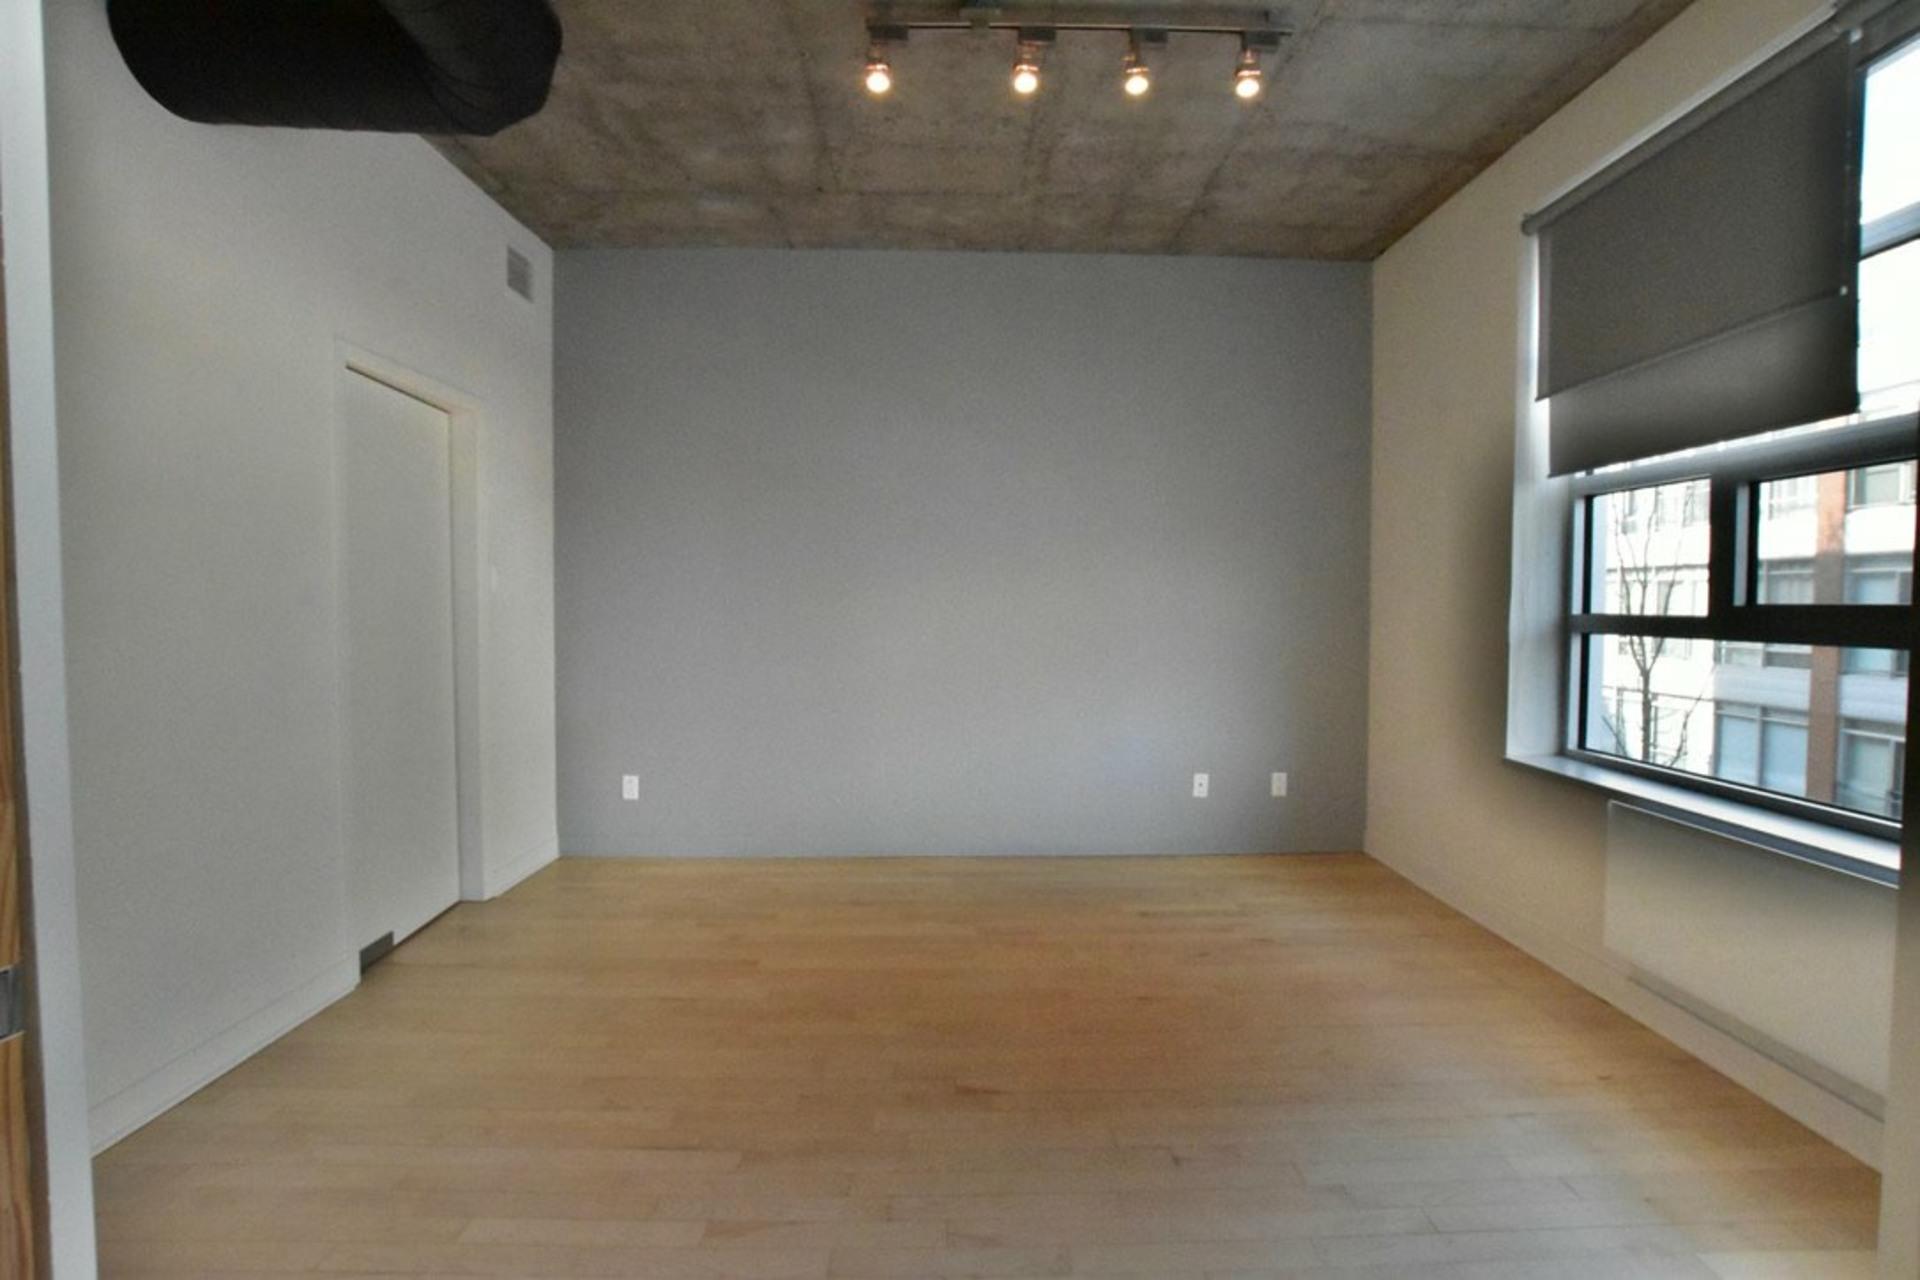 image 20 - Departamento Para alquiler Villeray/Saint-Michel/Parc-Extension Montréal  - 3 habitaciones